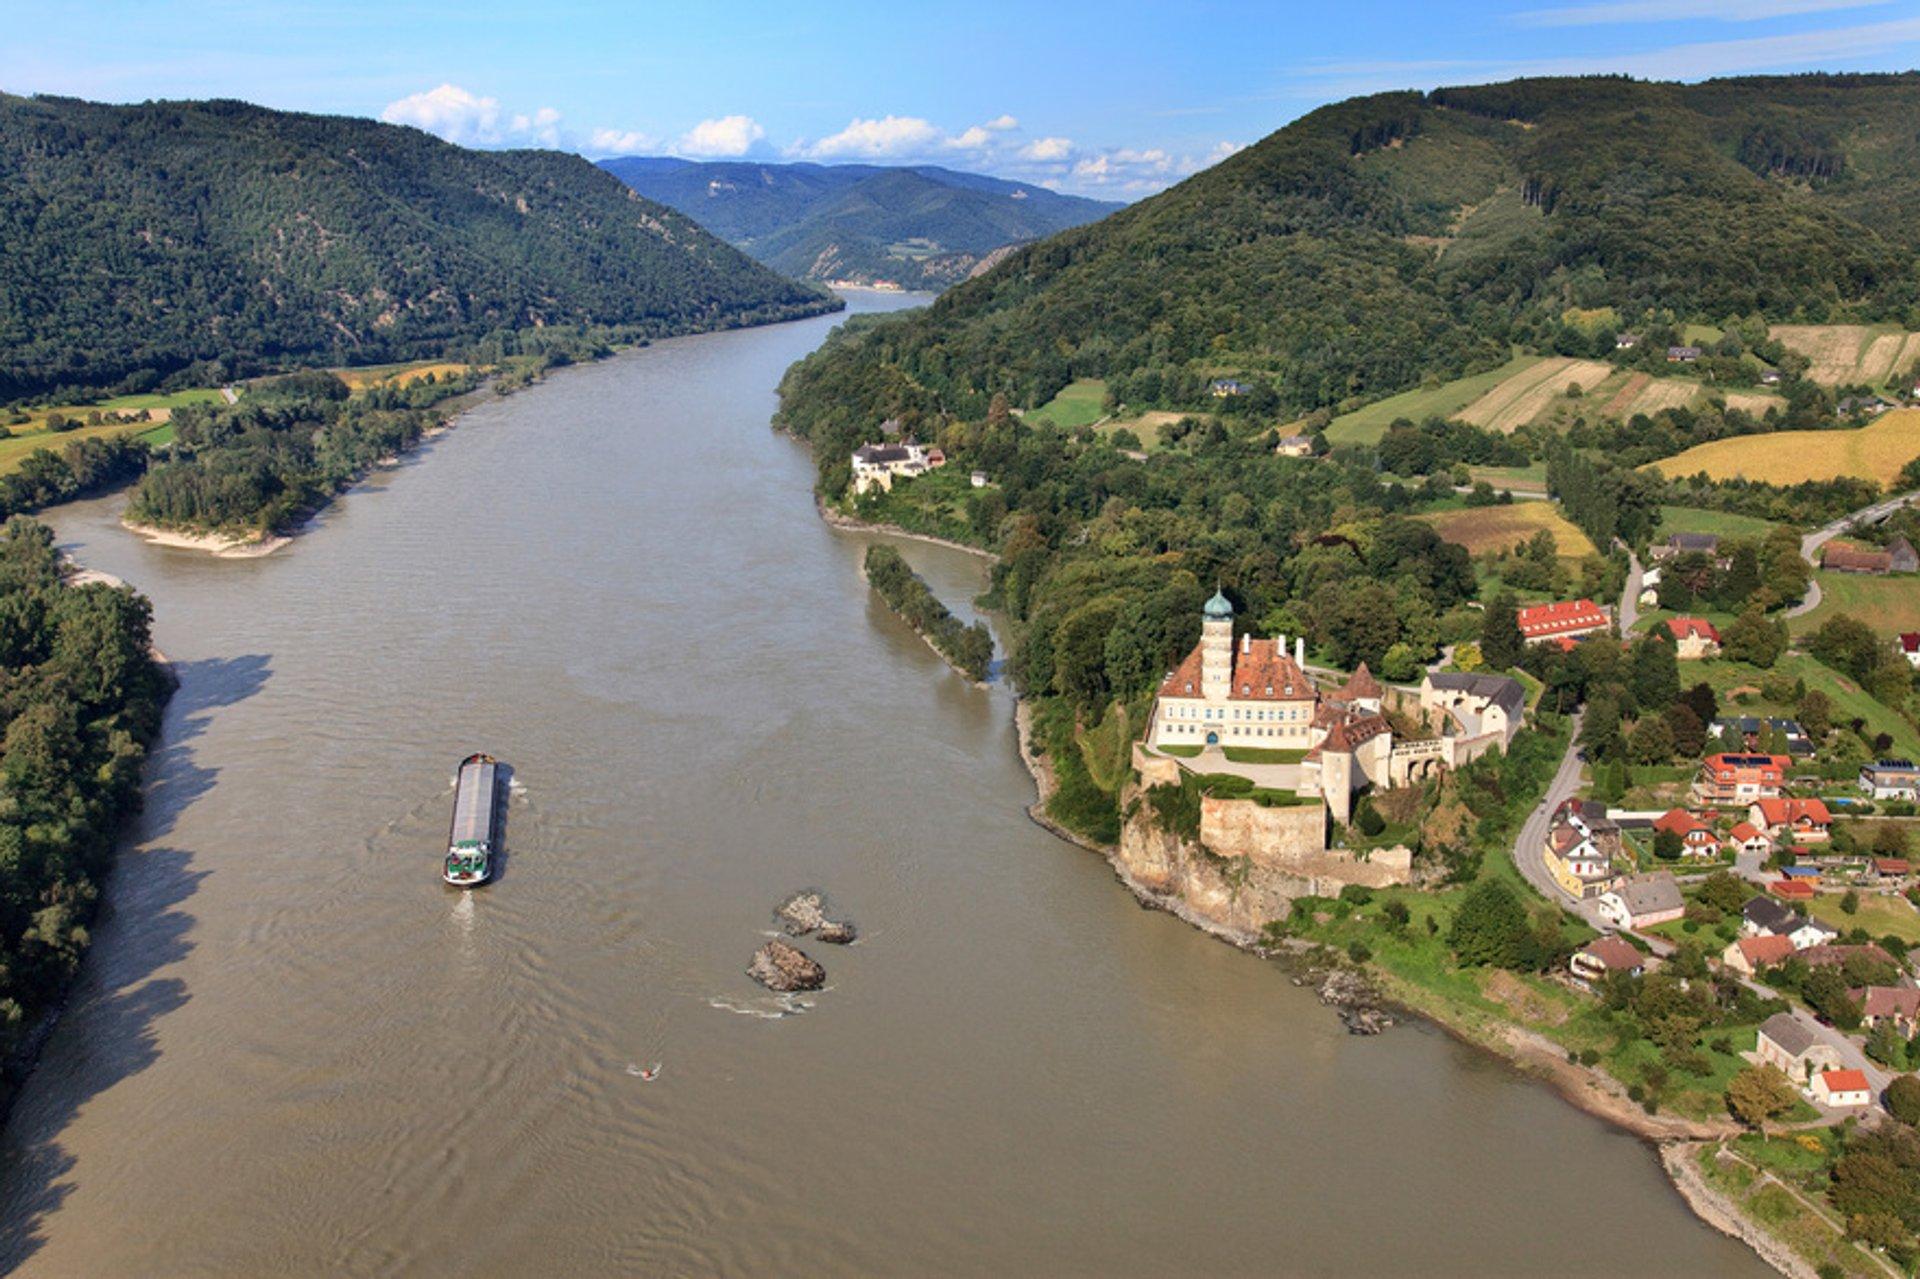 Danube Boat Trip in Austria - Best Season 2020